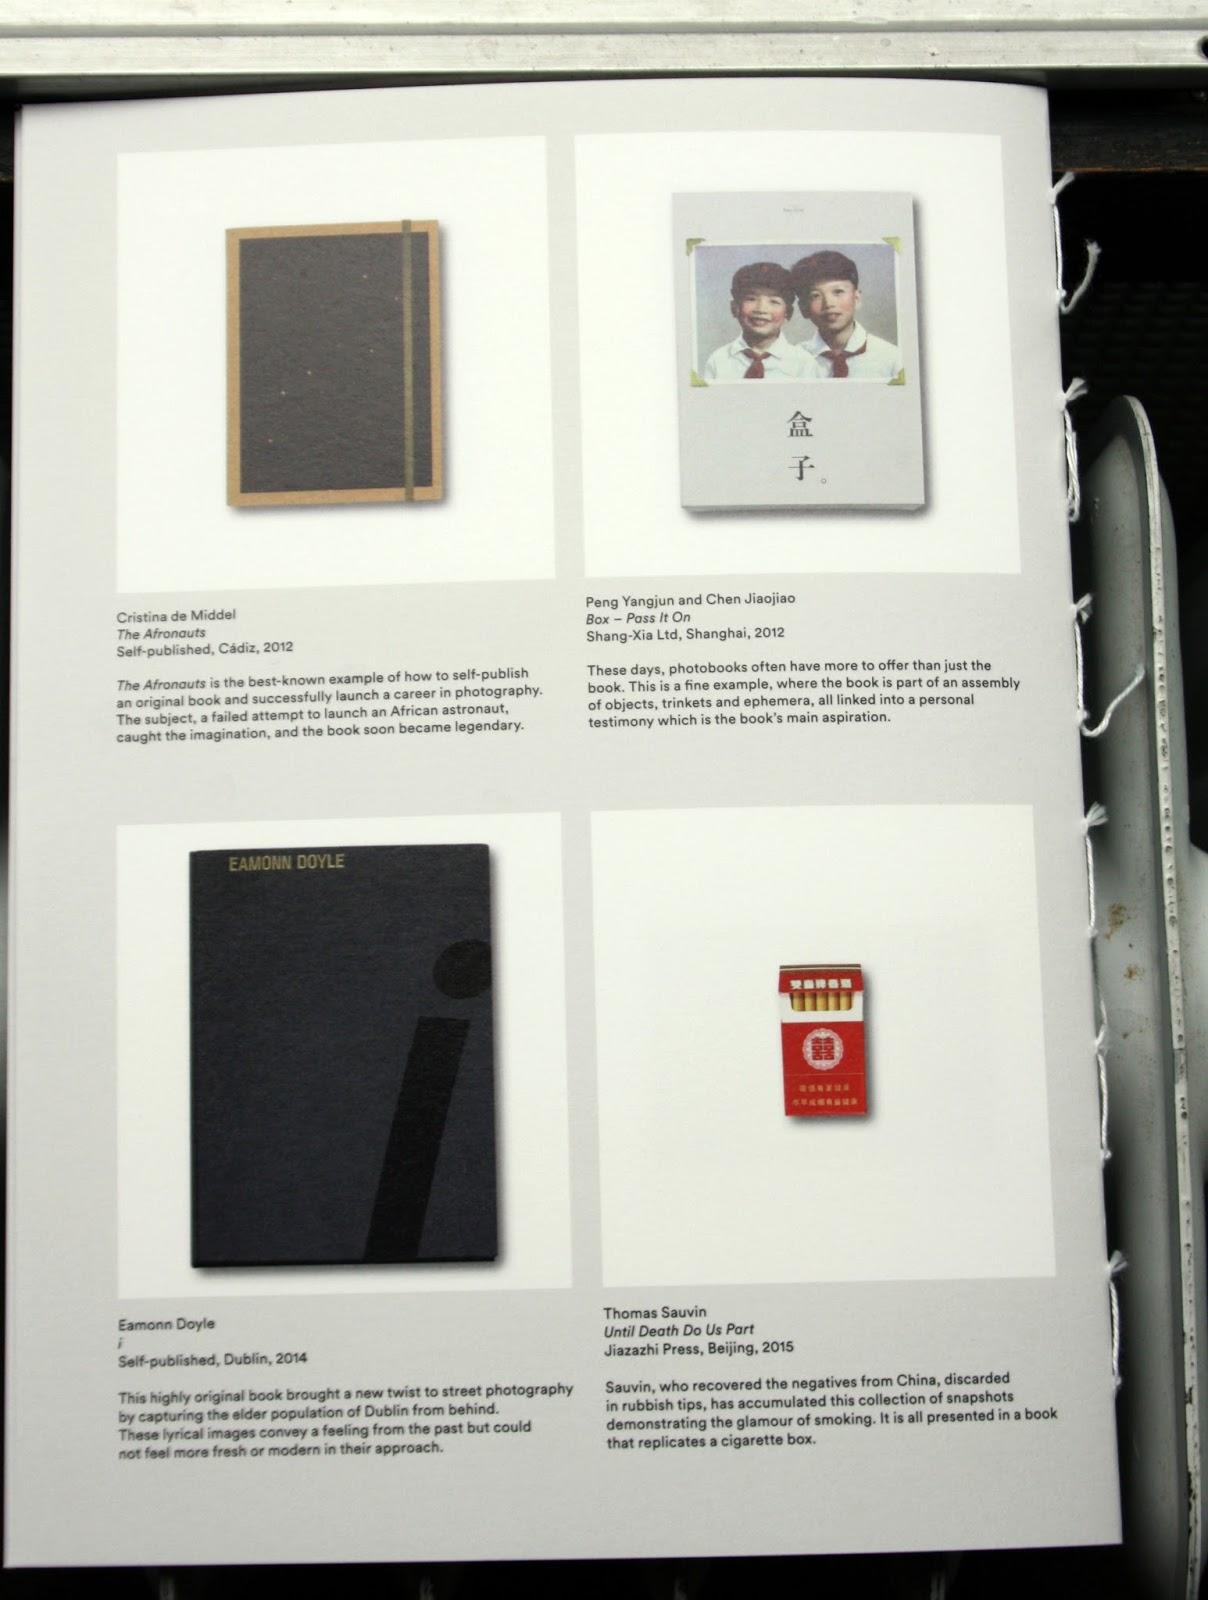 Bint photobooks on internet augustus 2017 hans eijkelboom potraits and cameras 1949 2009 photography solutioingenieria Choice Image